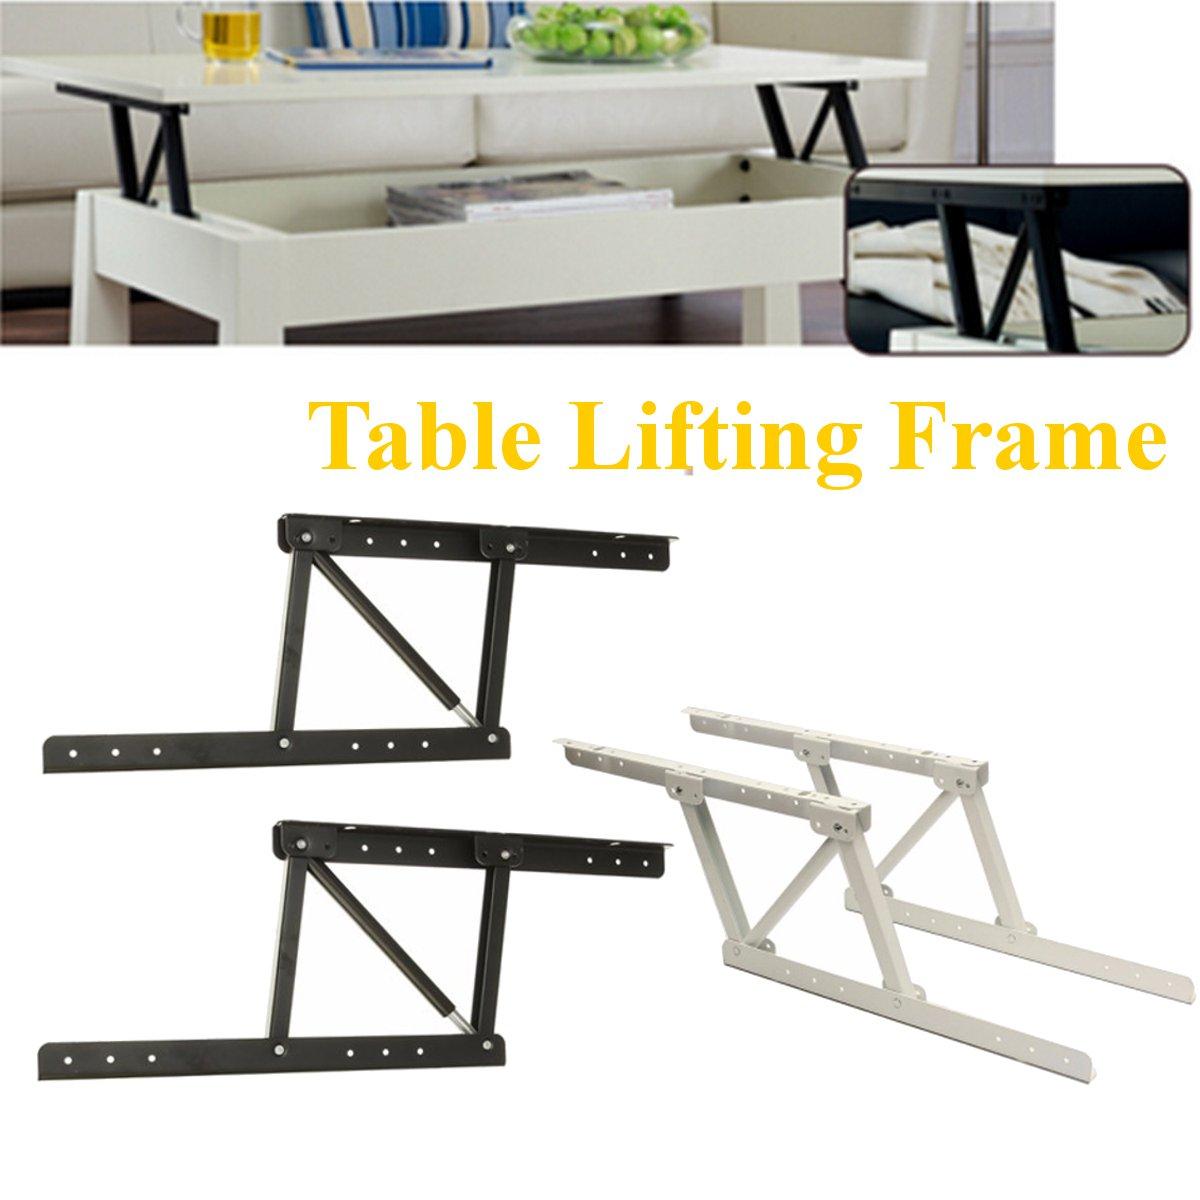 2pcs/set Folding Spring Tea Table Hinge Furniture Lift Up Top Mechanism Hardware Lifting Rack Shelf For Coffee Computer Table